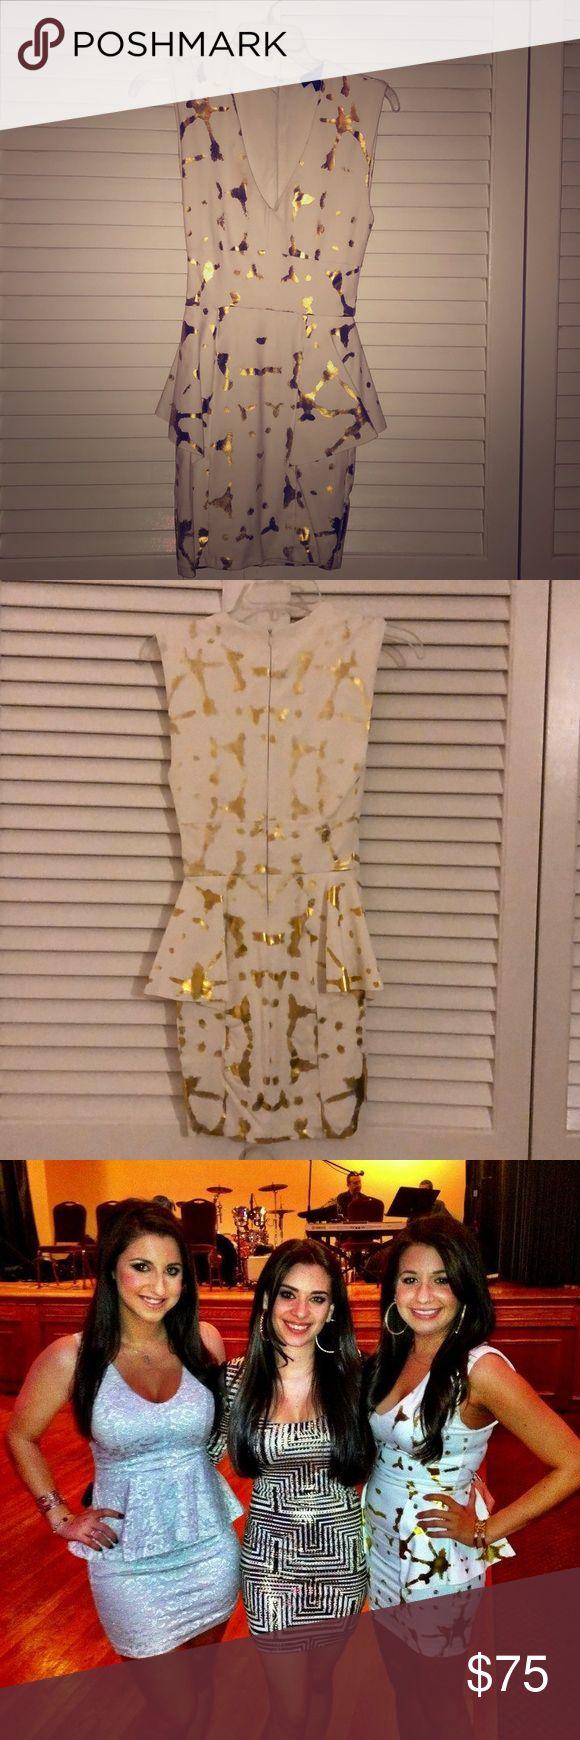 Bebe- White and Gold Peplum Dress Worn once. V-neck white peplum dress with gold splatter details. Size XS bebe Dresses Mini